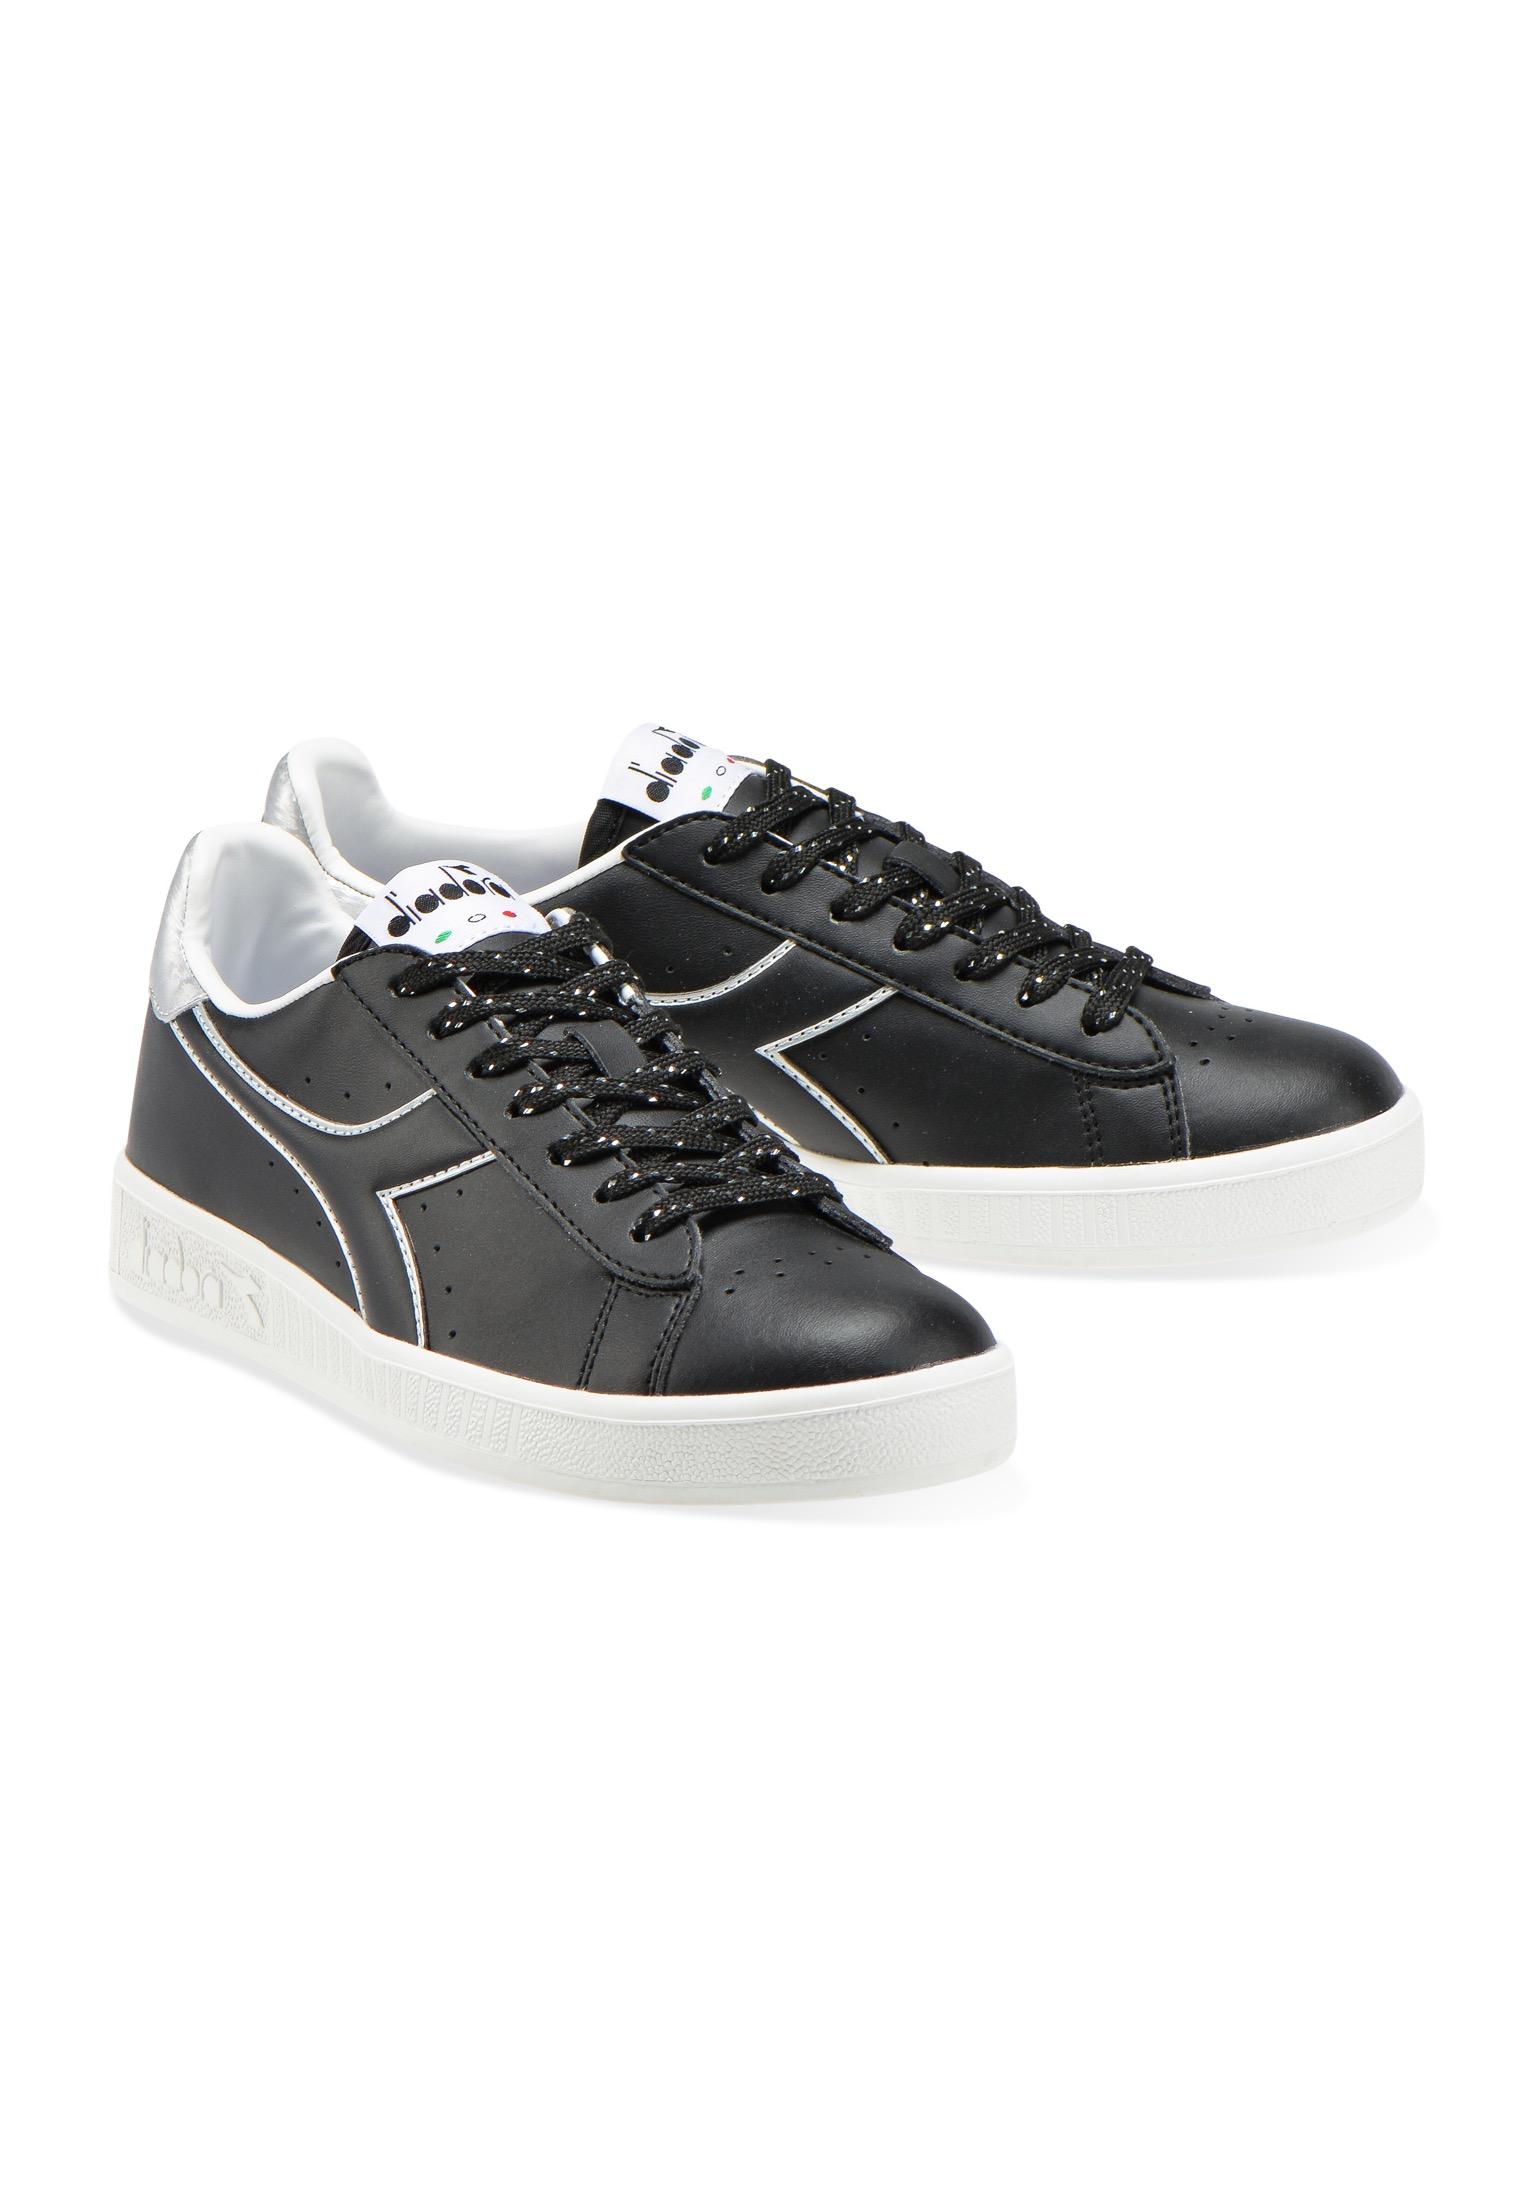 Diadora-Sneakers-GAME-P-WN-para-hombre-y-mujer miniatura 17